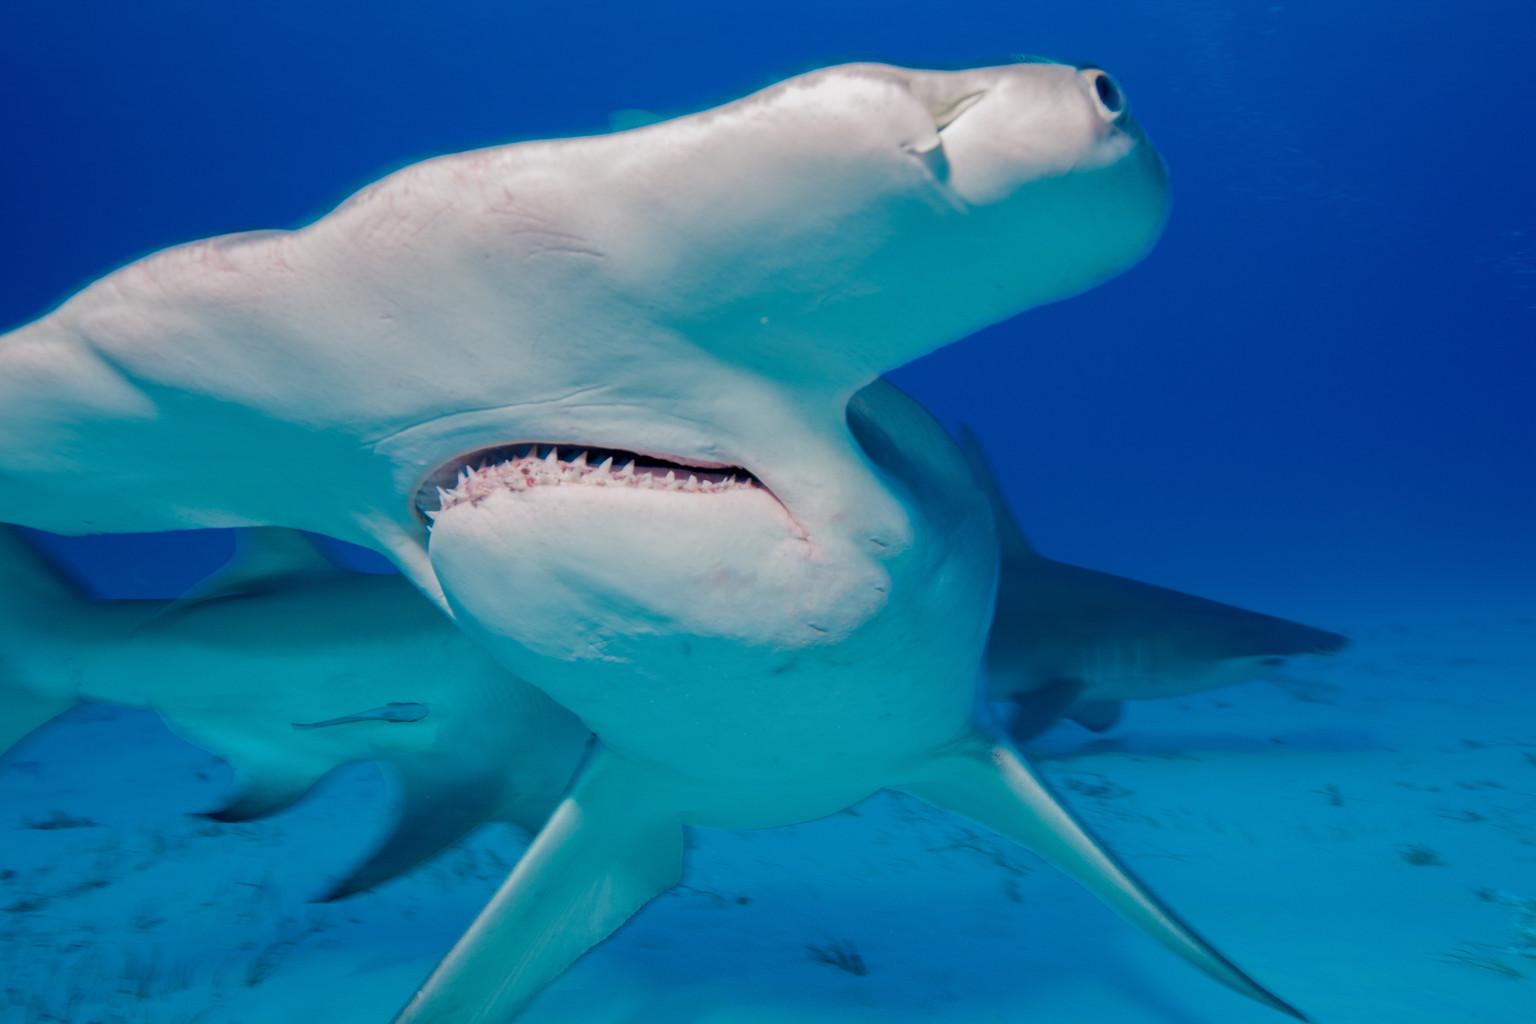 Hammerhead shark eating people - photo#13